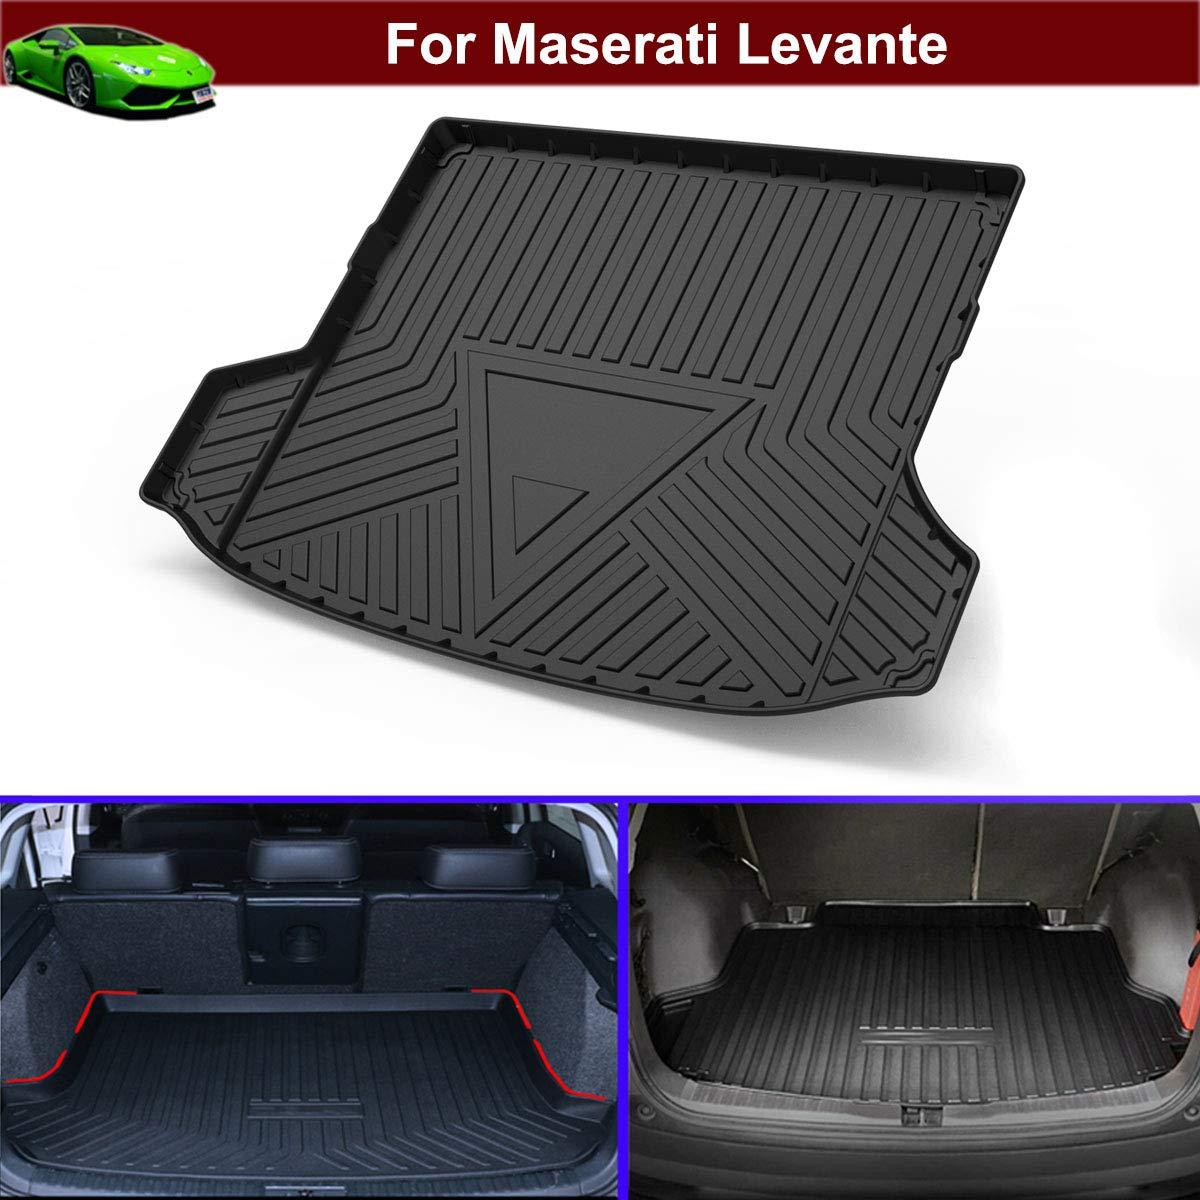 1pcs Black Rubber Car Mat Cargo Liners Car Boot Liner Cargo Mat Cargo Tray Floor Mat Cargo Cover Rear Trunk Mat Trunk Liner Tray for Maserati Levante 2017 2018 2019 2020